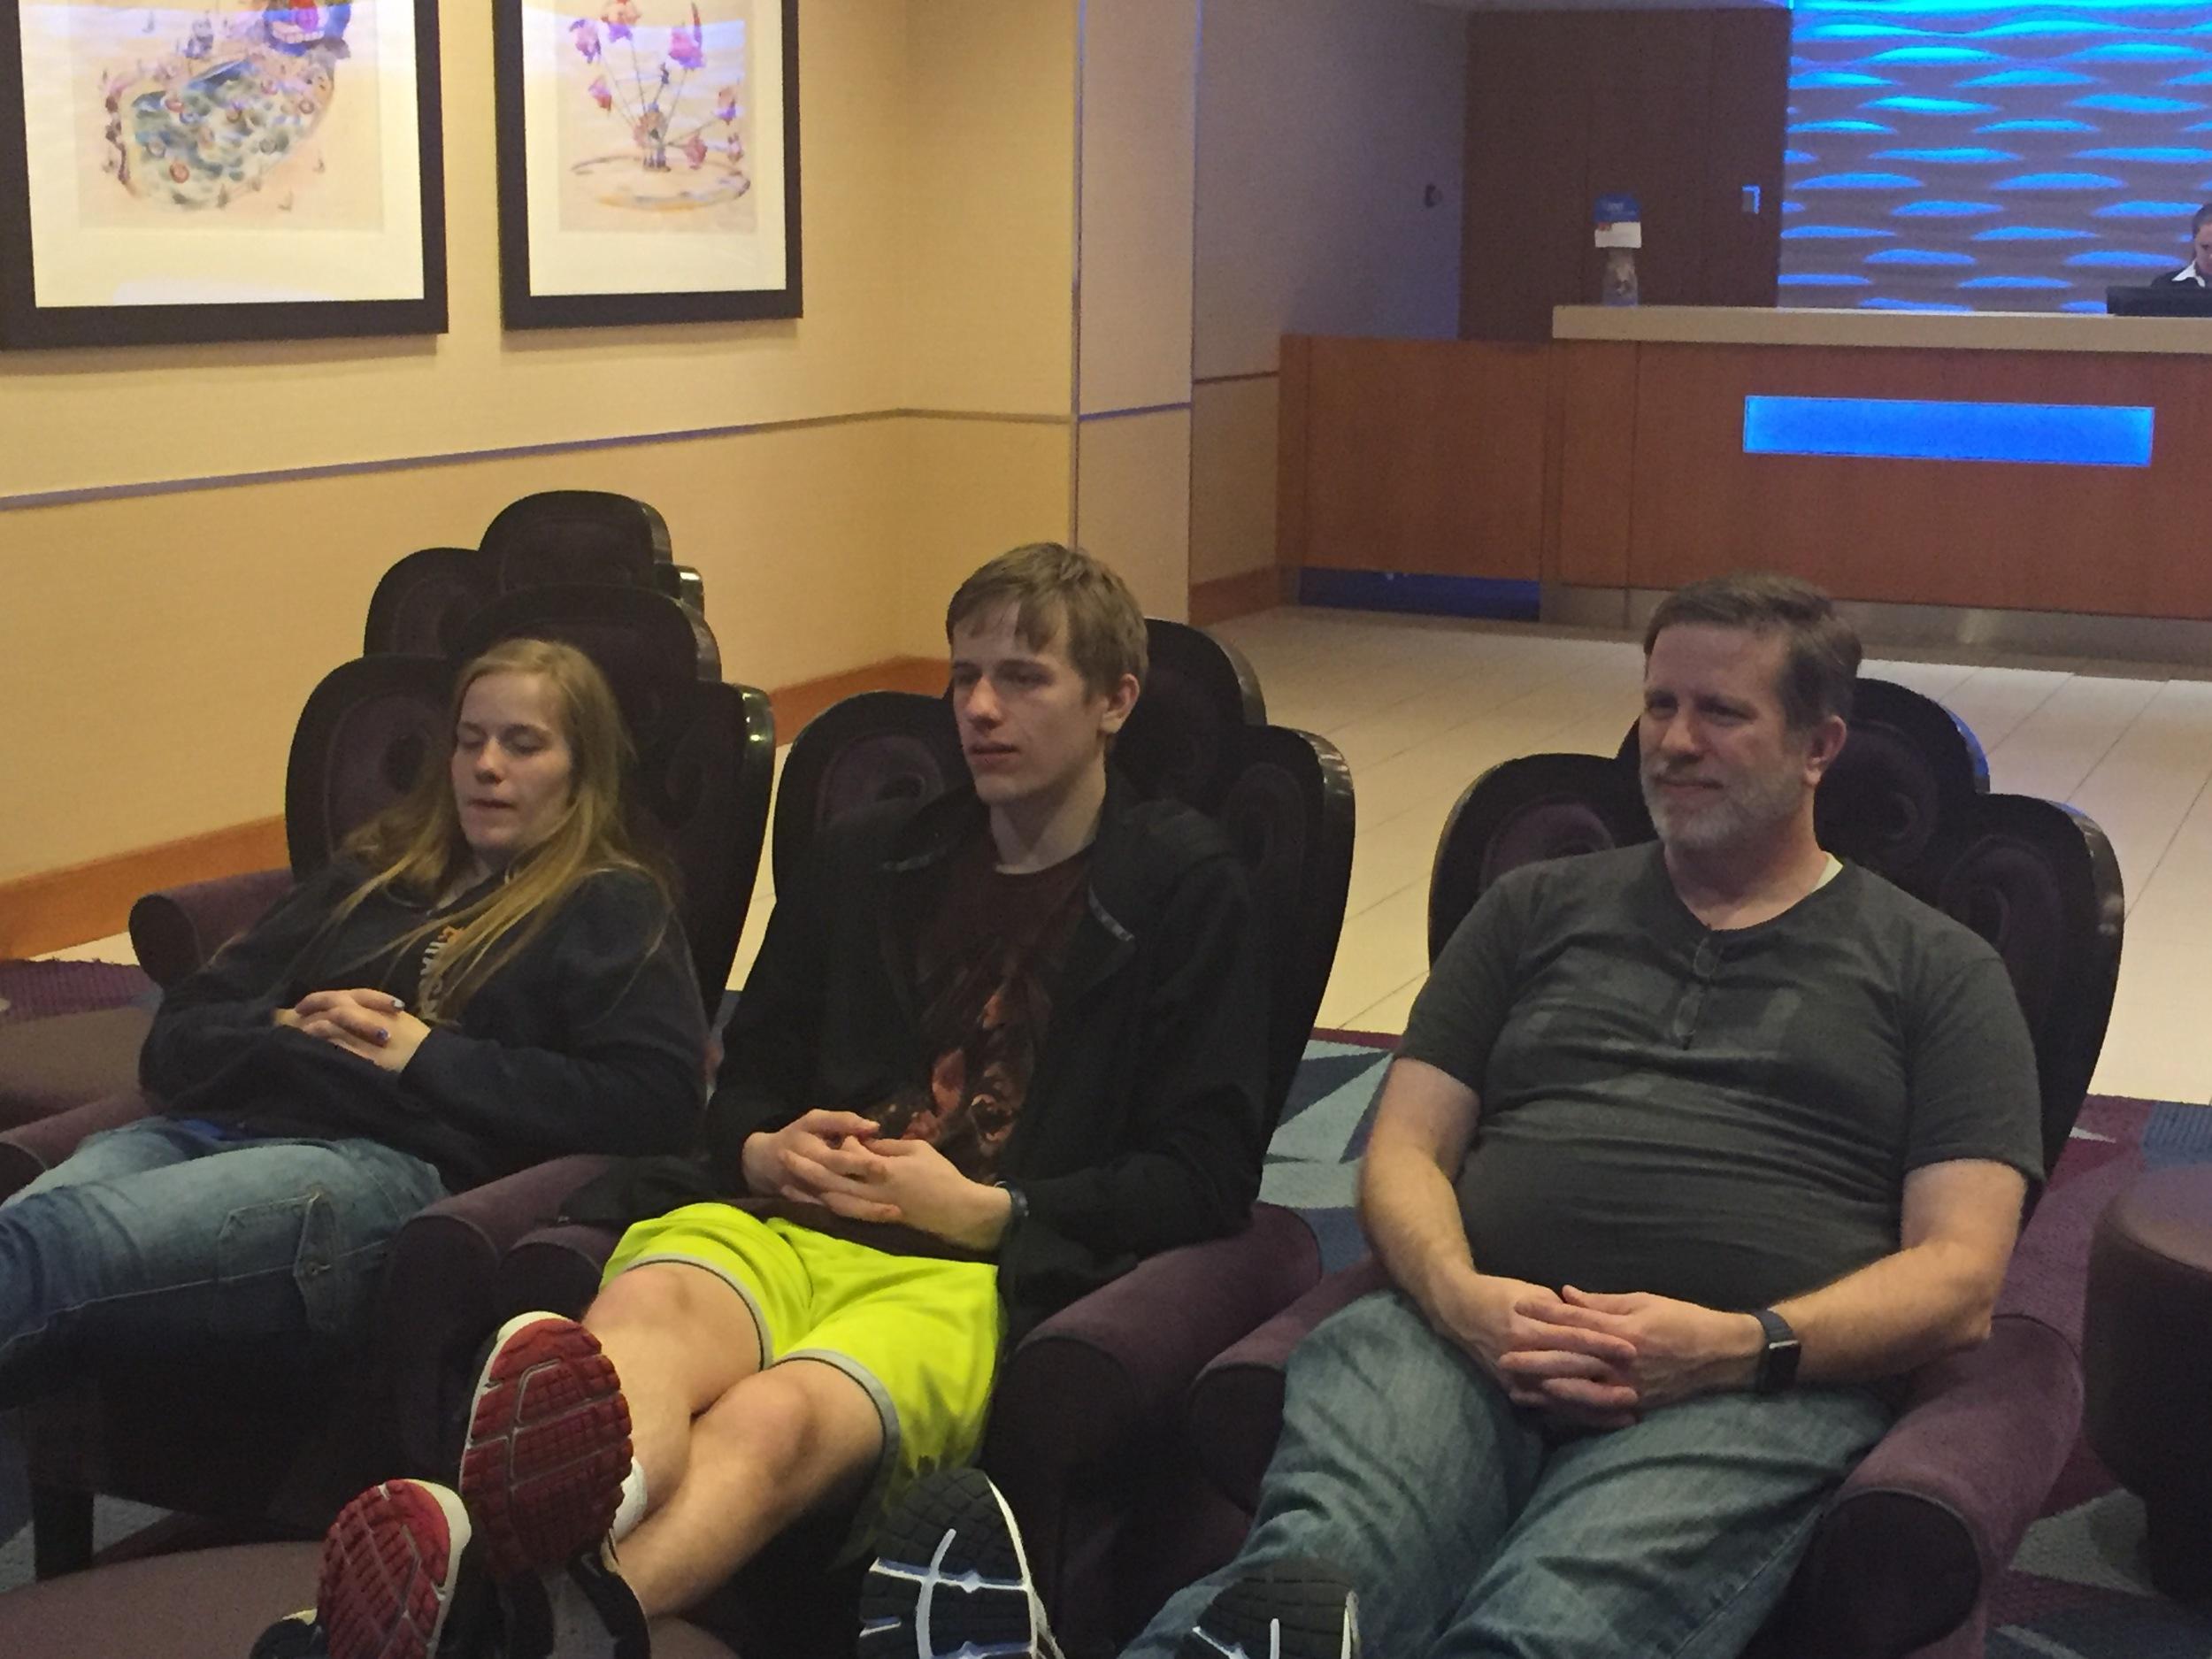 Jessie, Chris & Steve watching Disney cartoons!